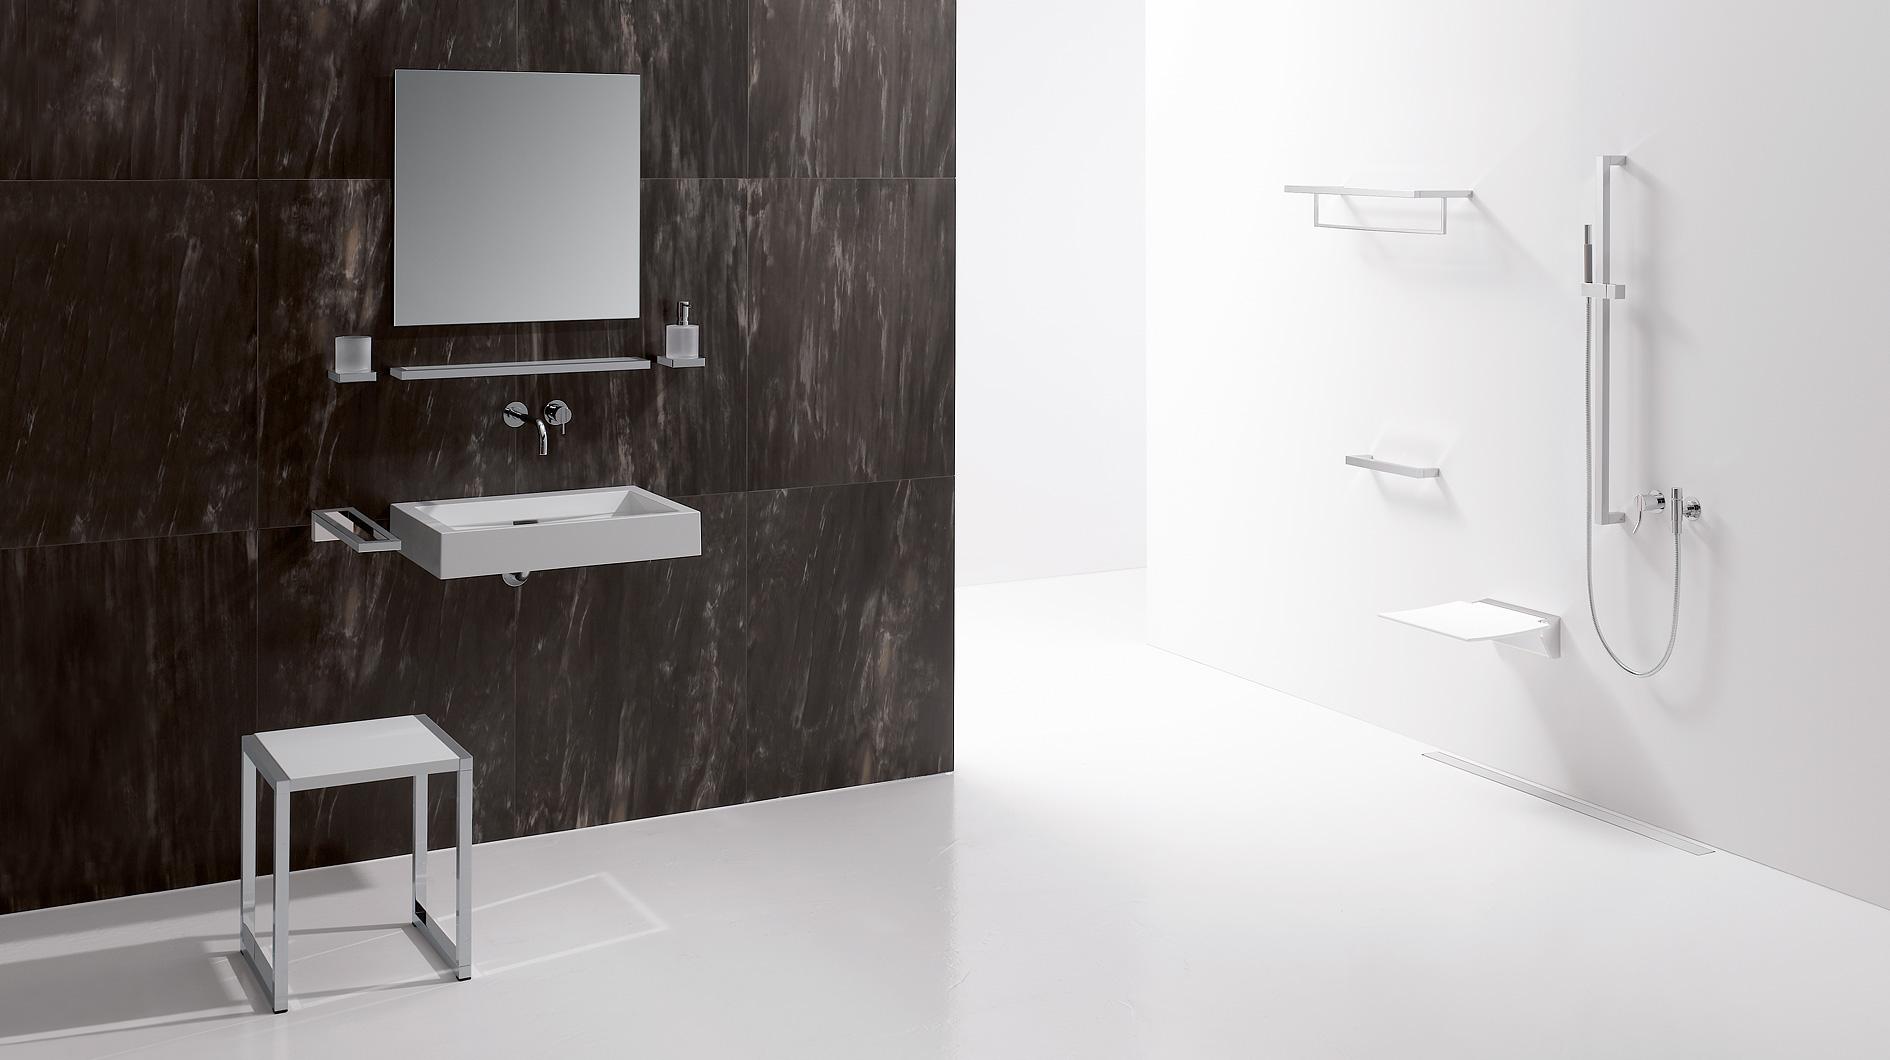 Betrouwbaar losse badkuip inspirerende idee n ontwerp met foto 39 s en voorbeelden - Badkuip ontwerp ...